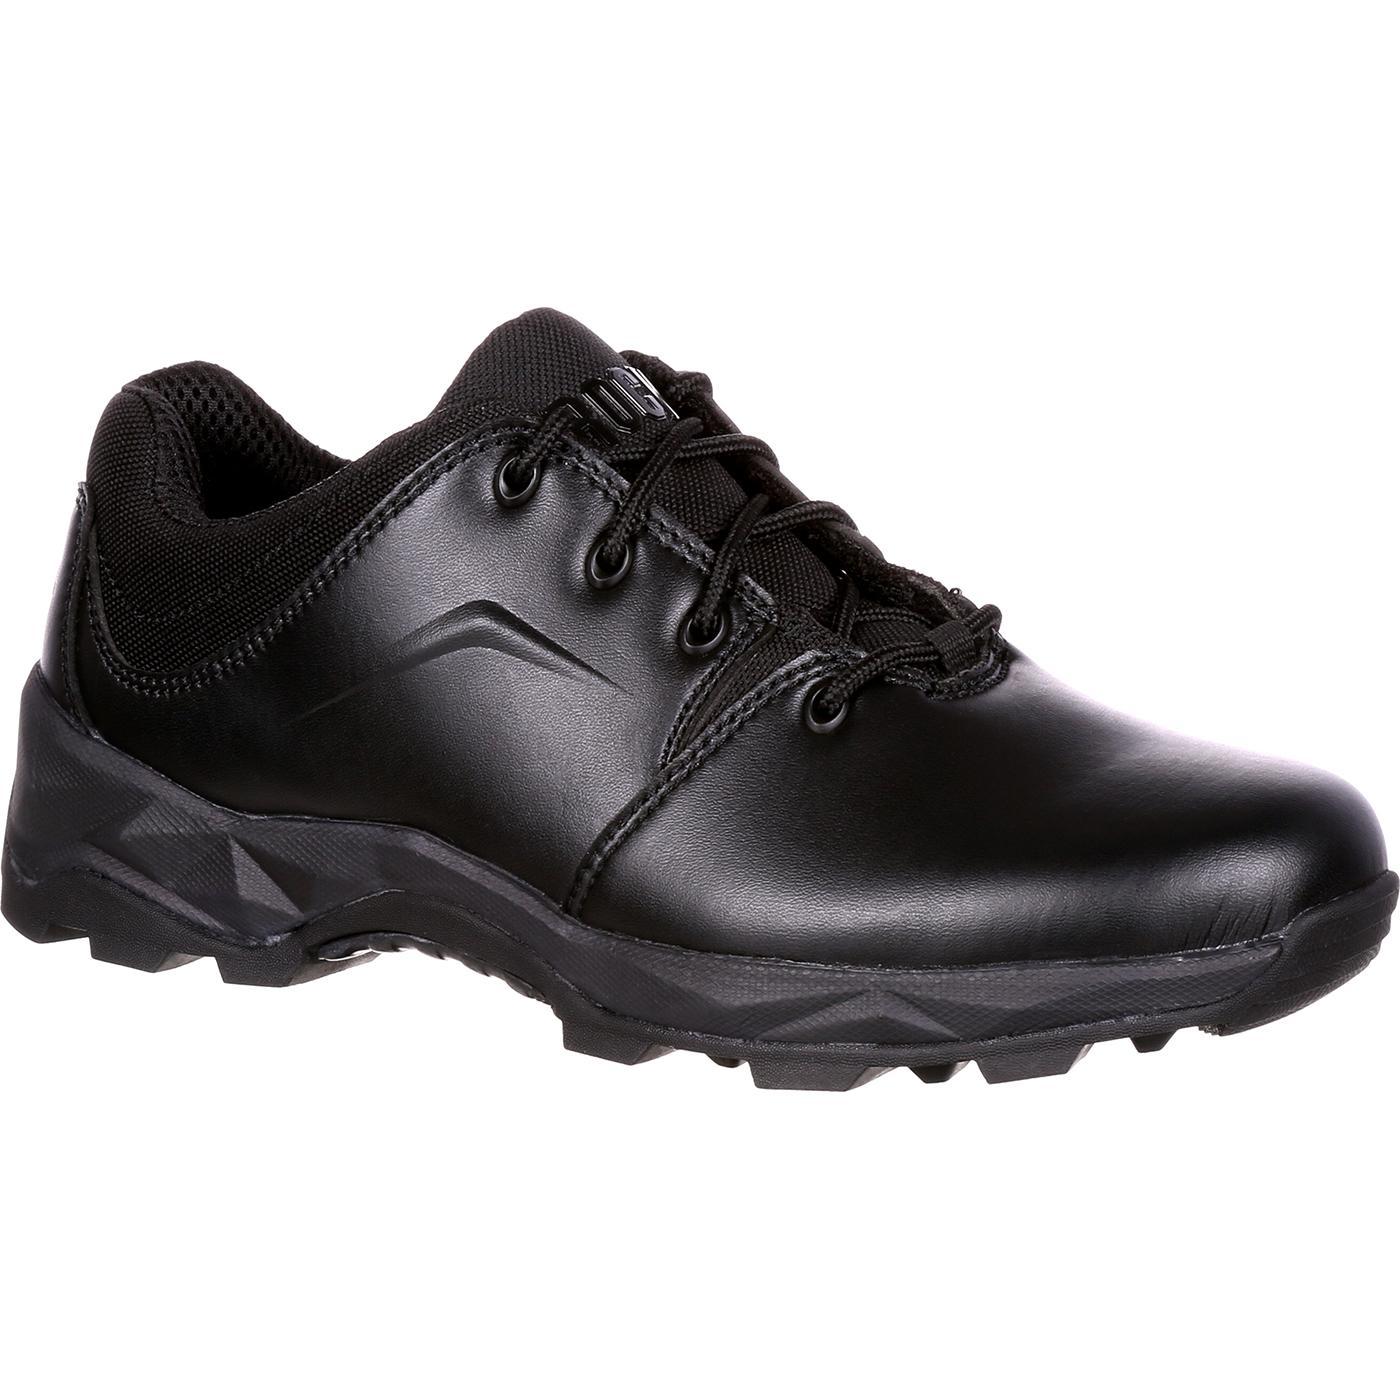 Rocky Elements of Service Duty Shoe, , large